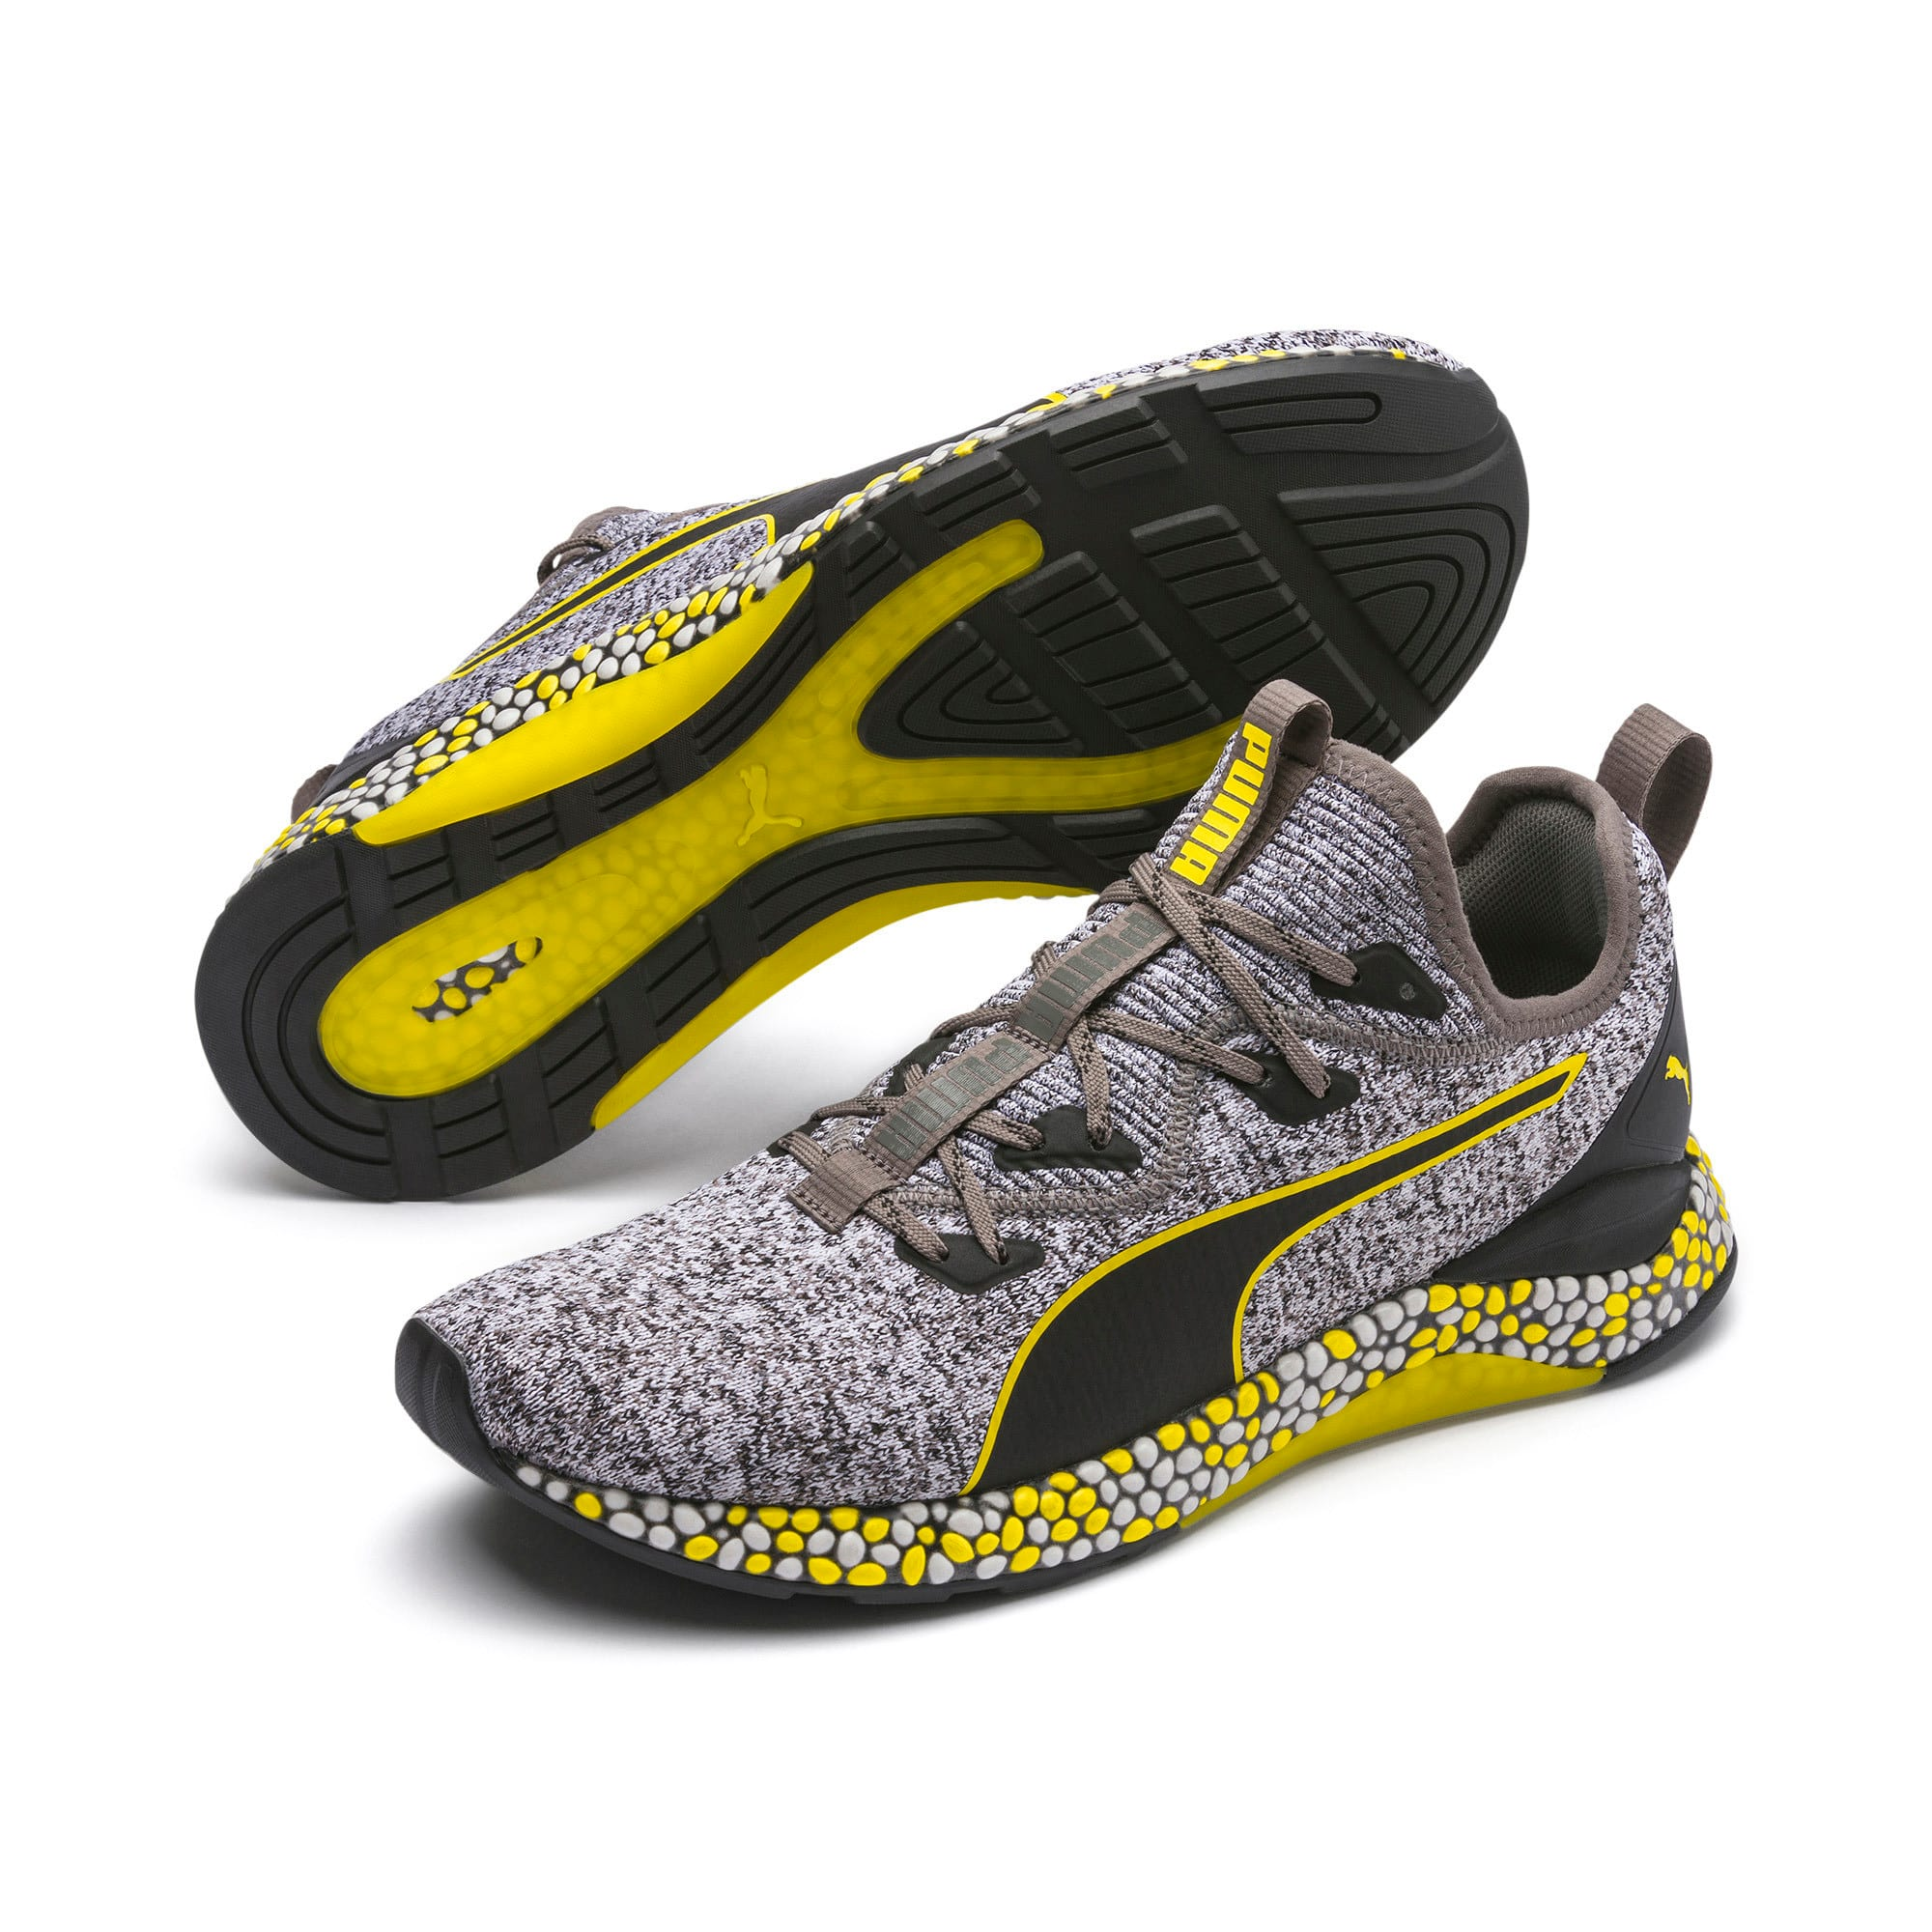 Thumbnail 2 of Hybrid Runner Men's Running Shoes, Black-White-Blazing Yellow, medium